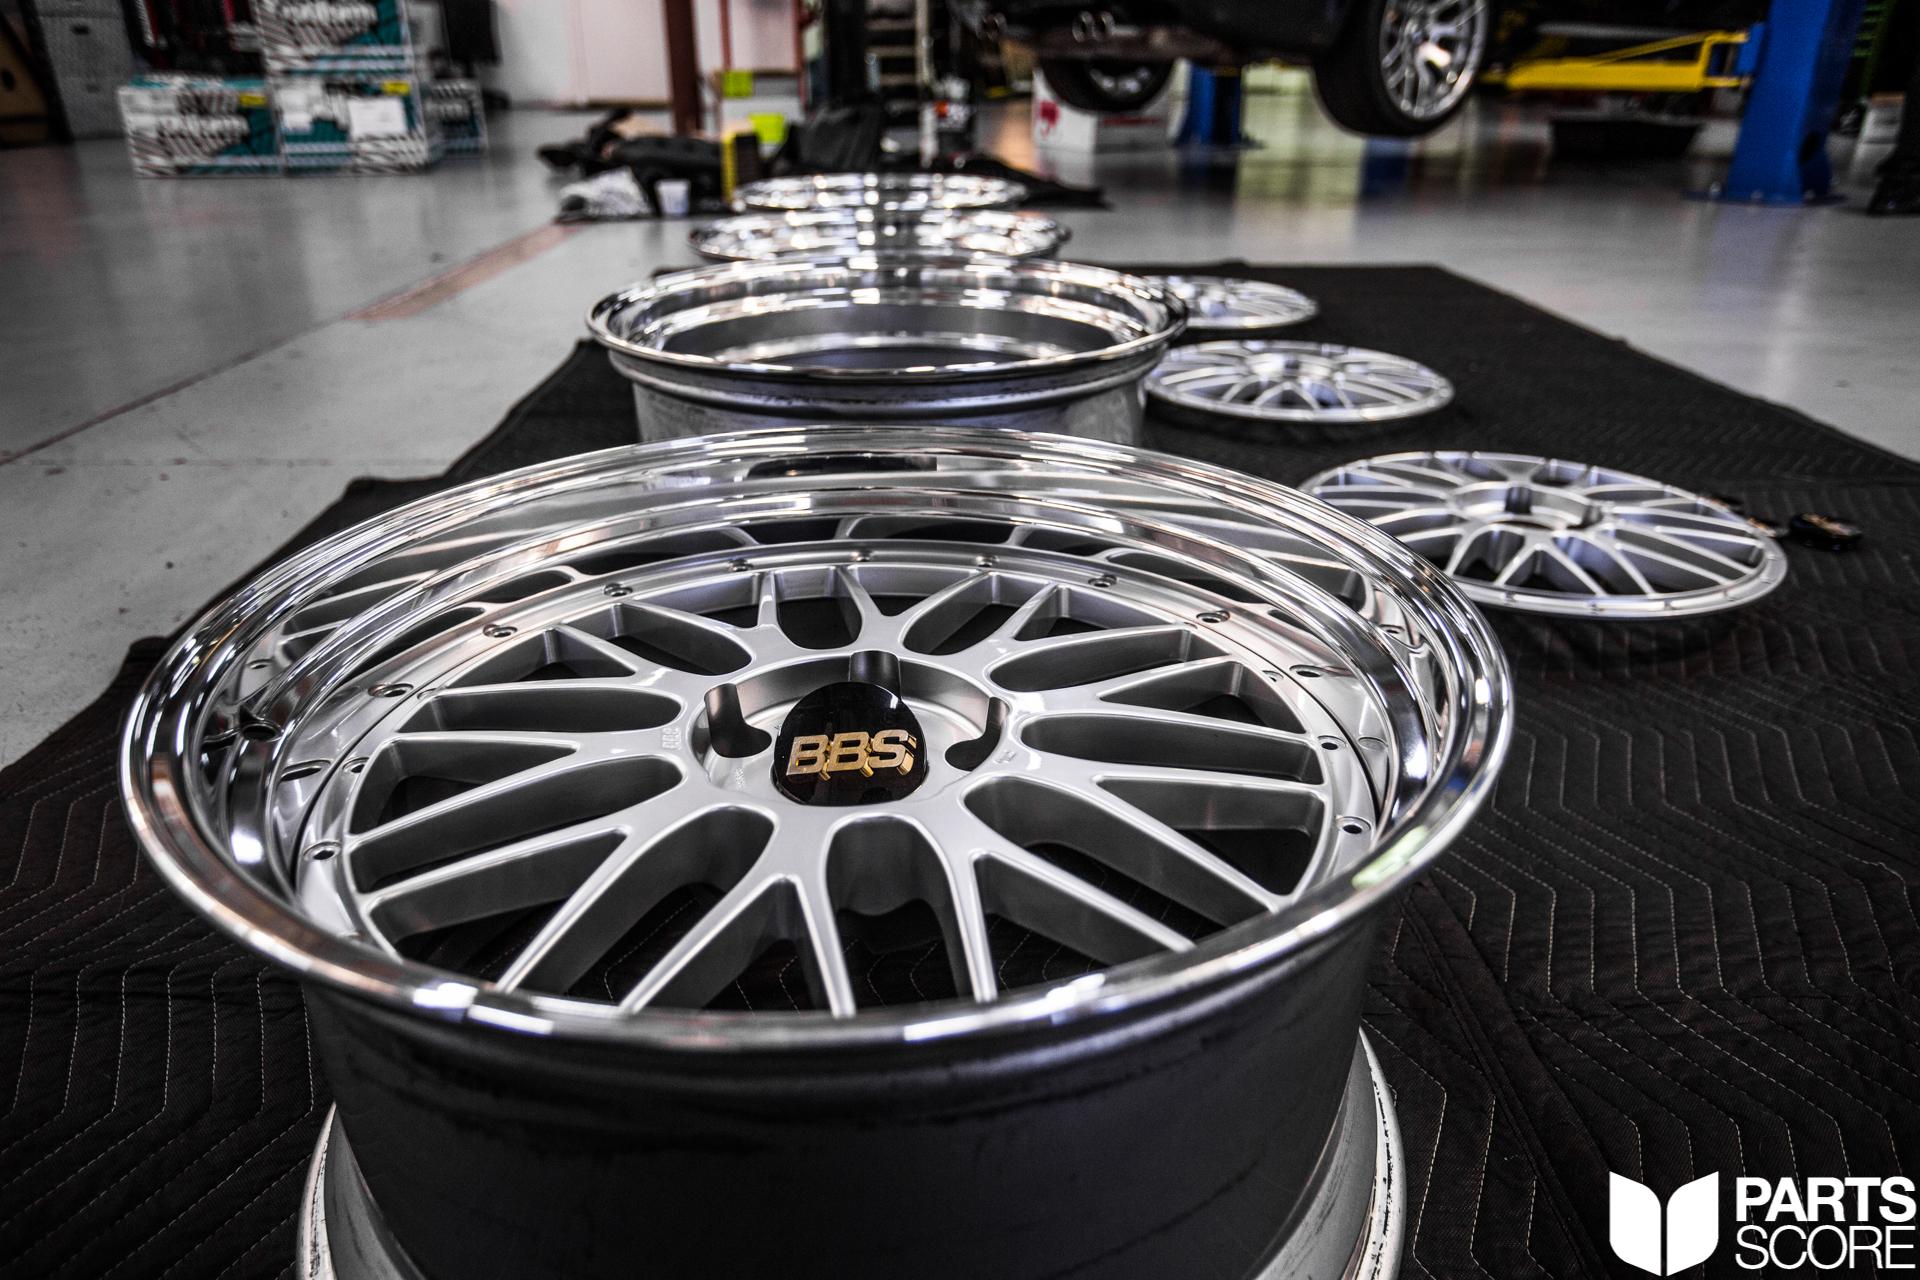 rotiformwheels, fifteen52, fifteen52wheels, hrewheels, vmrwheels, watercooledind, 3sdm, 3sdmwheels, avantgarde, avantgardewheels, apexwheels, bbswheels, vossen, vossenwheels, toyo, toyotires, rotiform, fifteen52, hre, vmr, bbs, partsscore, parts score, scottsdale, arizona, scottsdalearizona, wheels, tires, wheels and tires, restoration